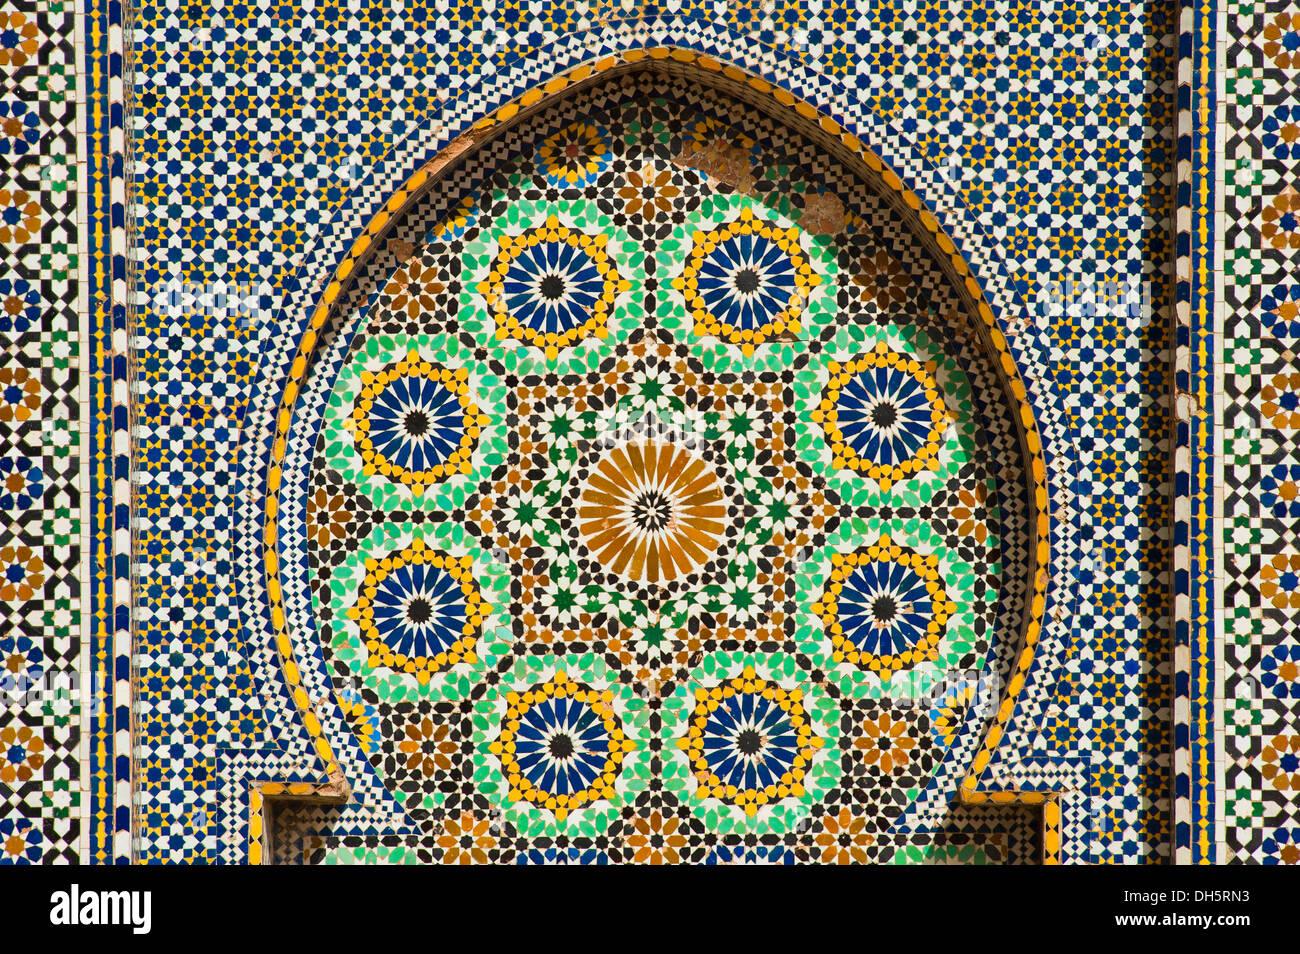 Mosaici di piastrelle zellige zillij o zellij tilework su una